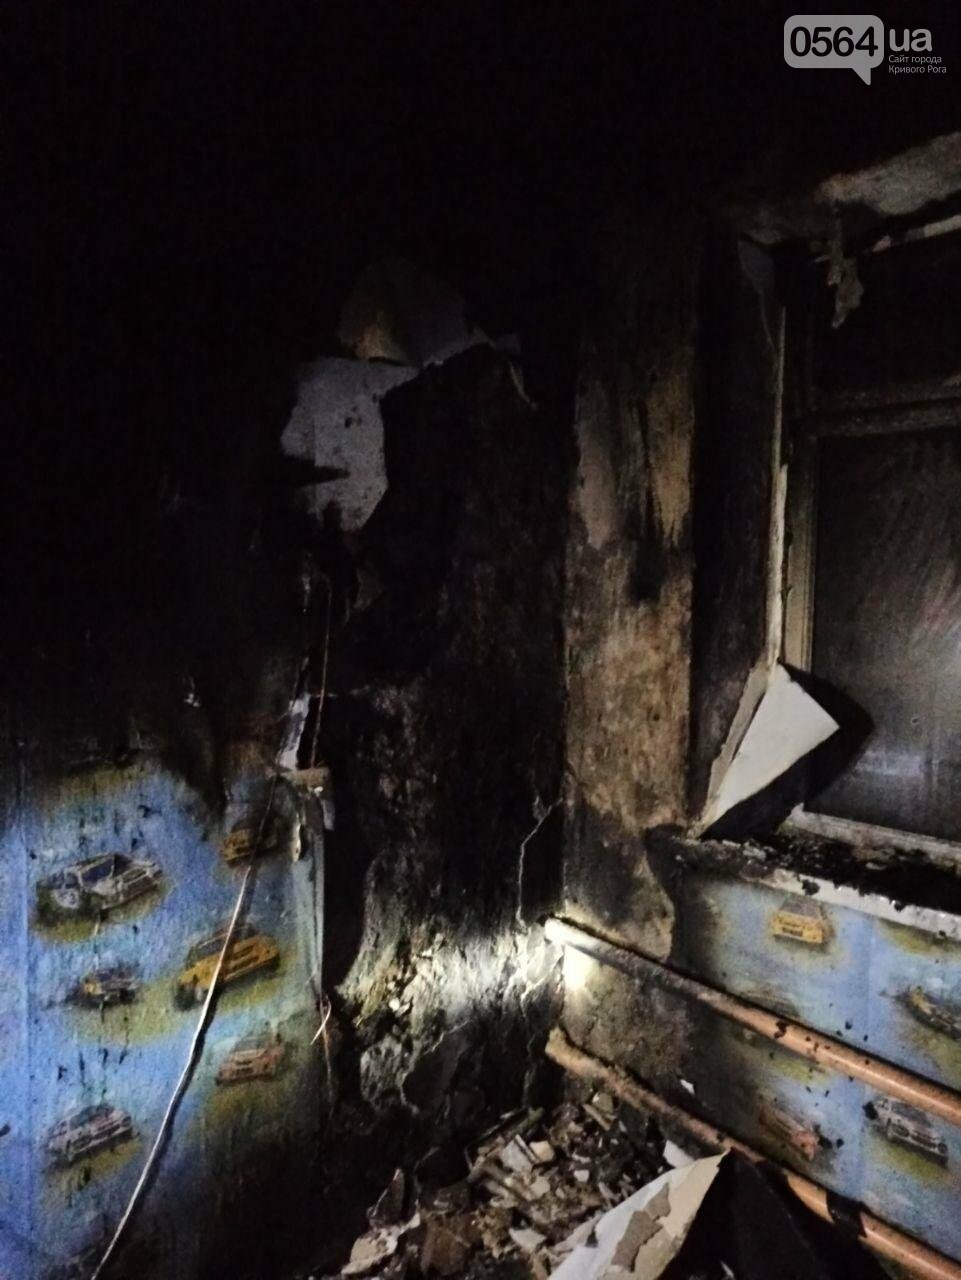 Во время пожара в Кривом Роге пострадал 70-летний пенсионер, - ФОТО , фото-4